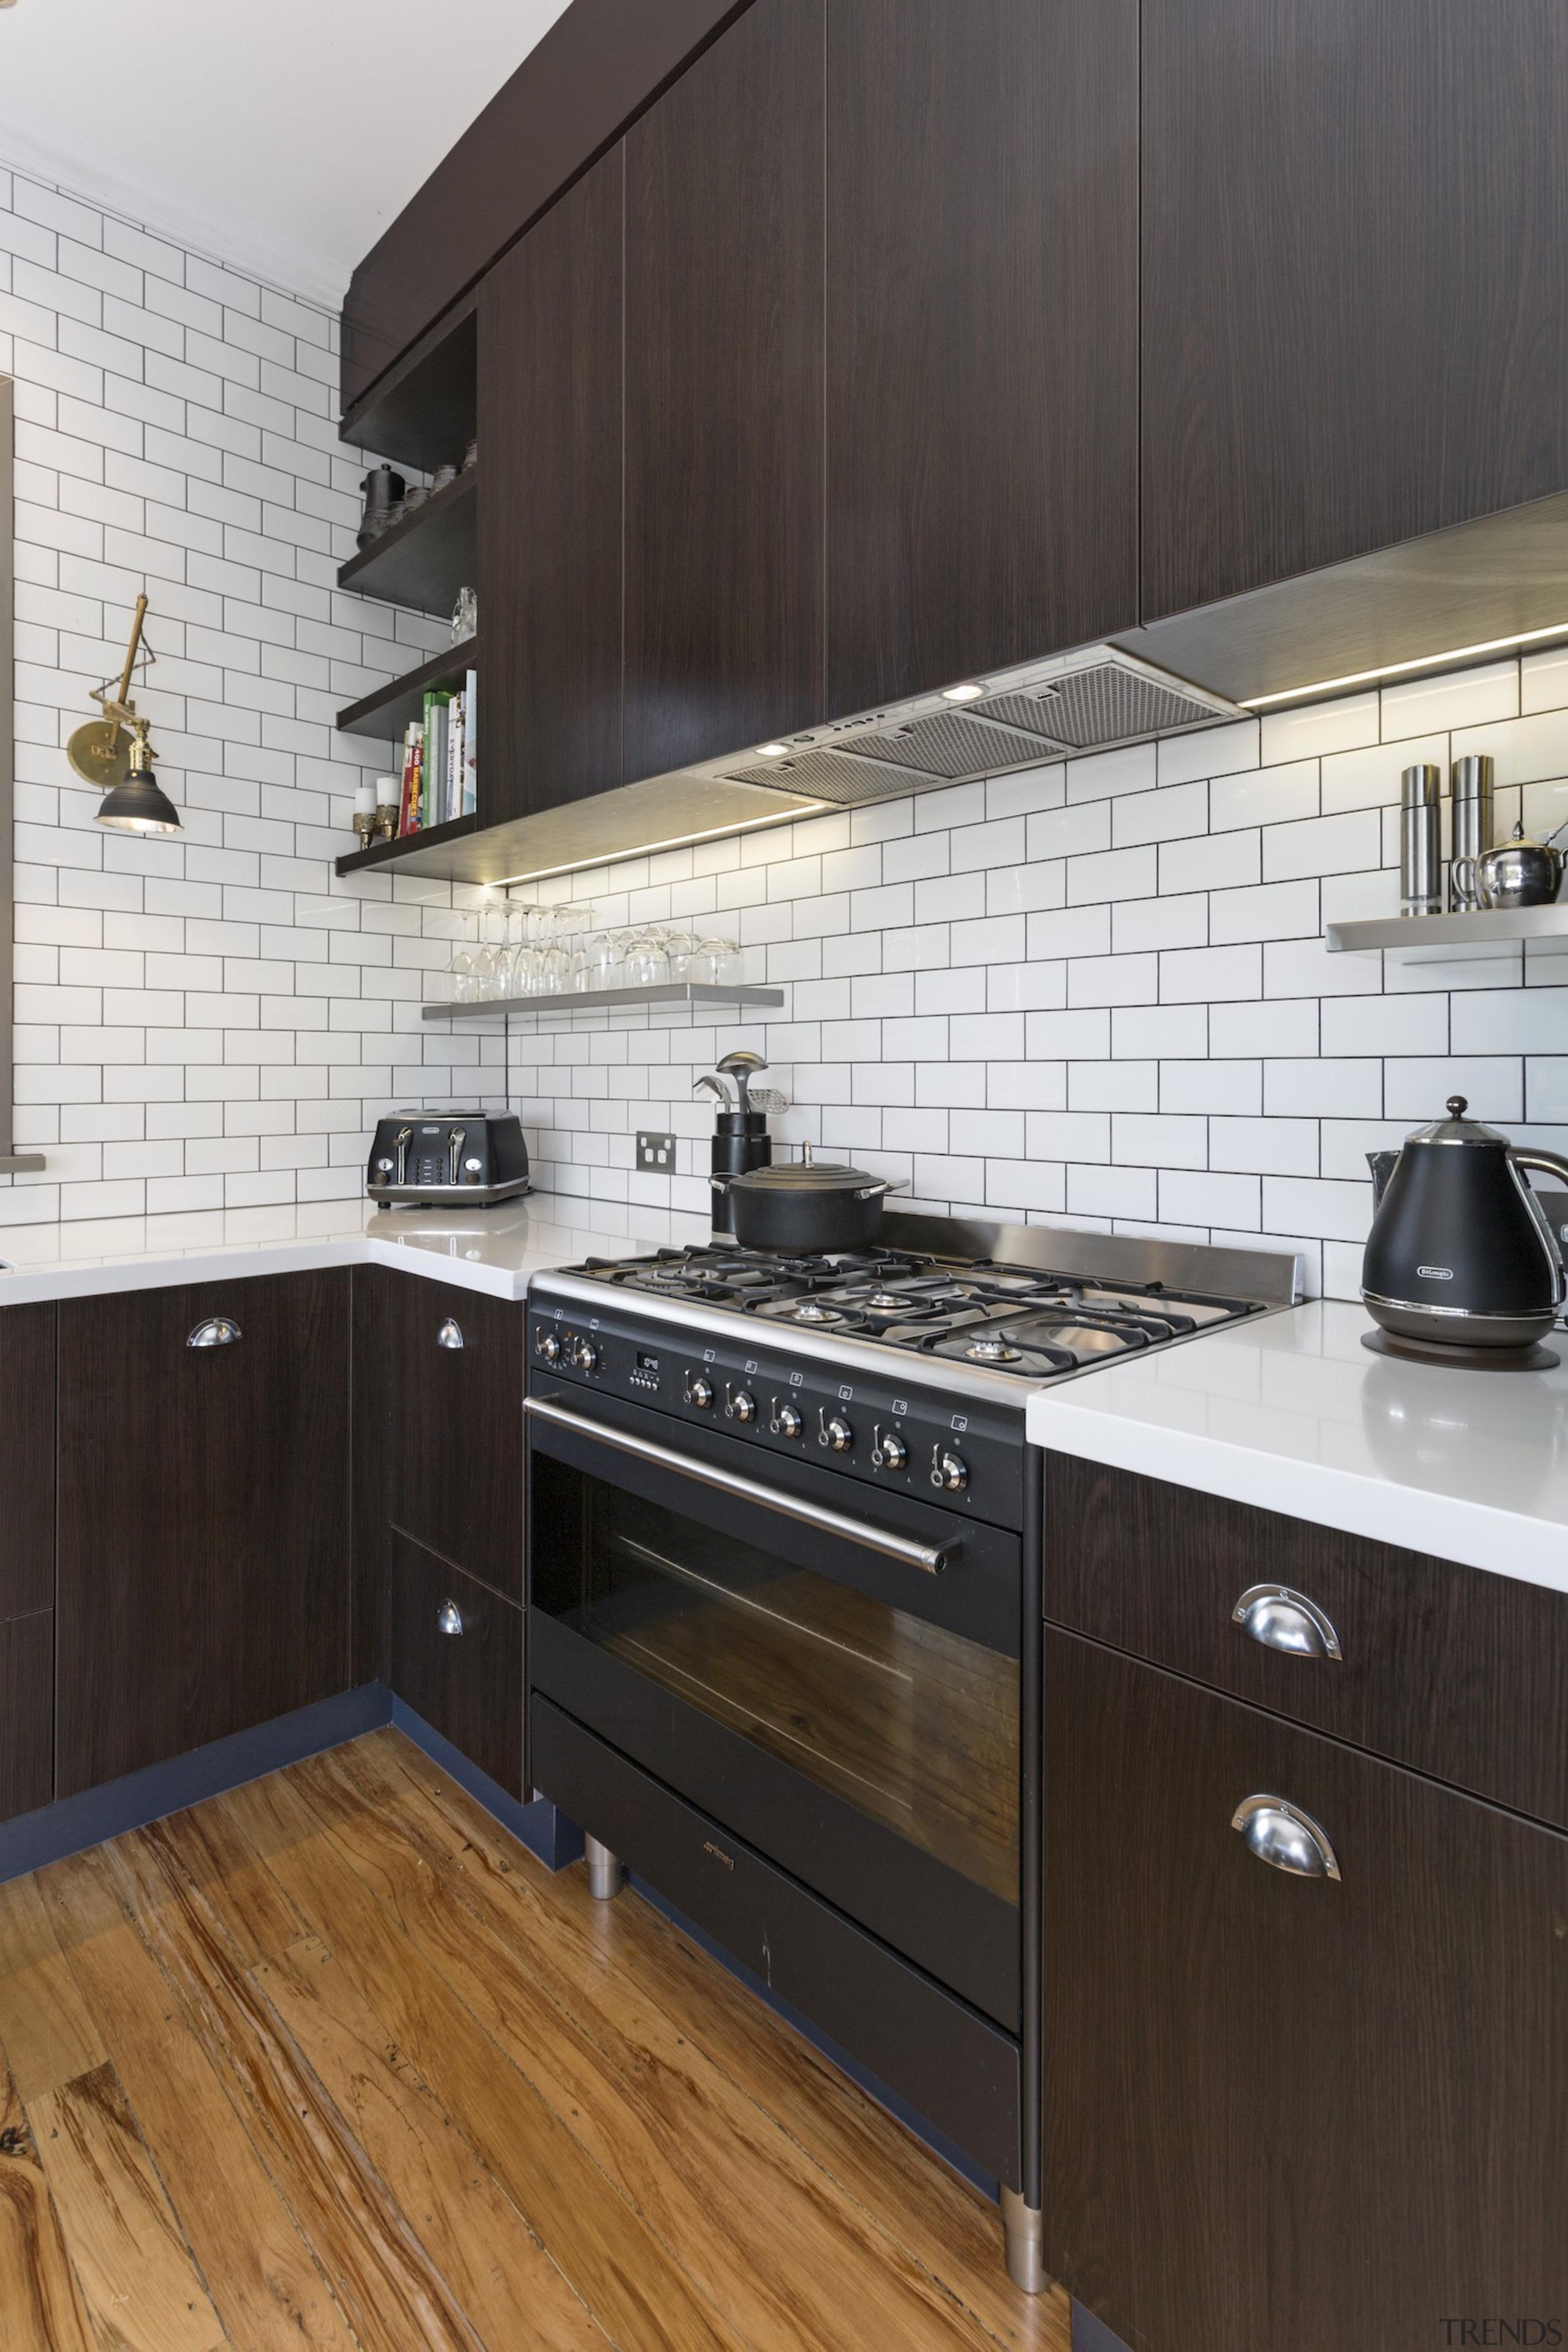 TIDA NZ 2017 – Designer kitchen entrant – cabinetry, countertop, cuisine classique, floor, flooring, hardwood, interior design, kitchen, kitchen stove, property, room, tile, wood flooring, black, white